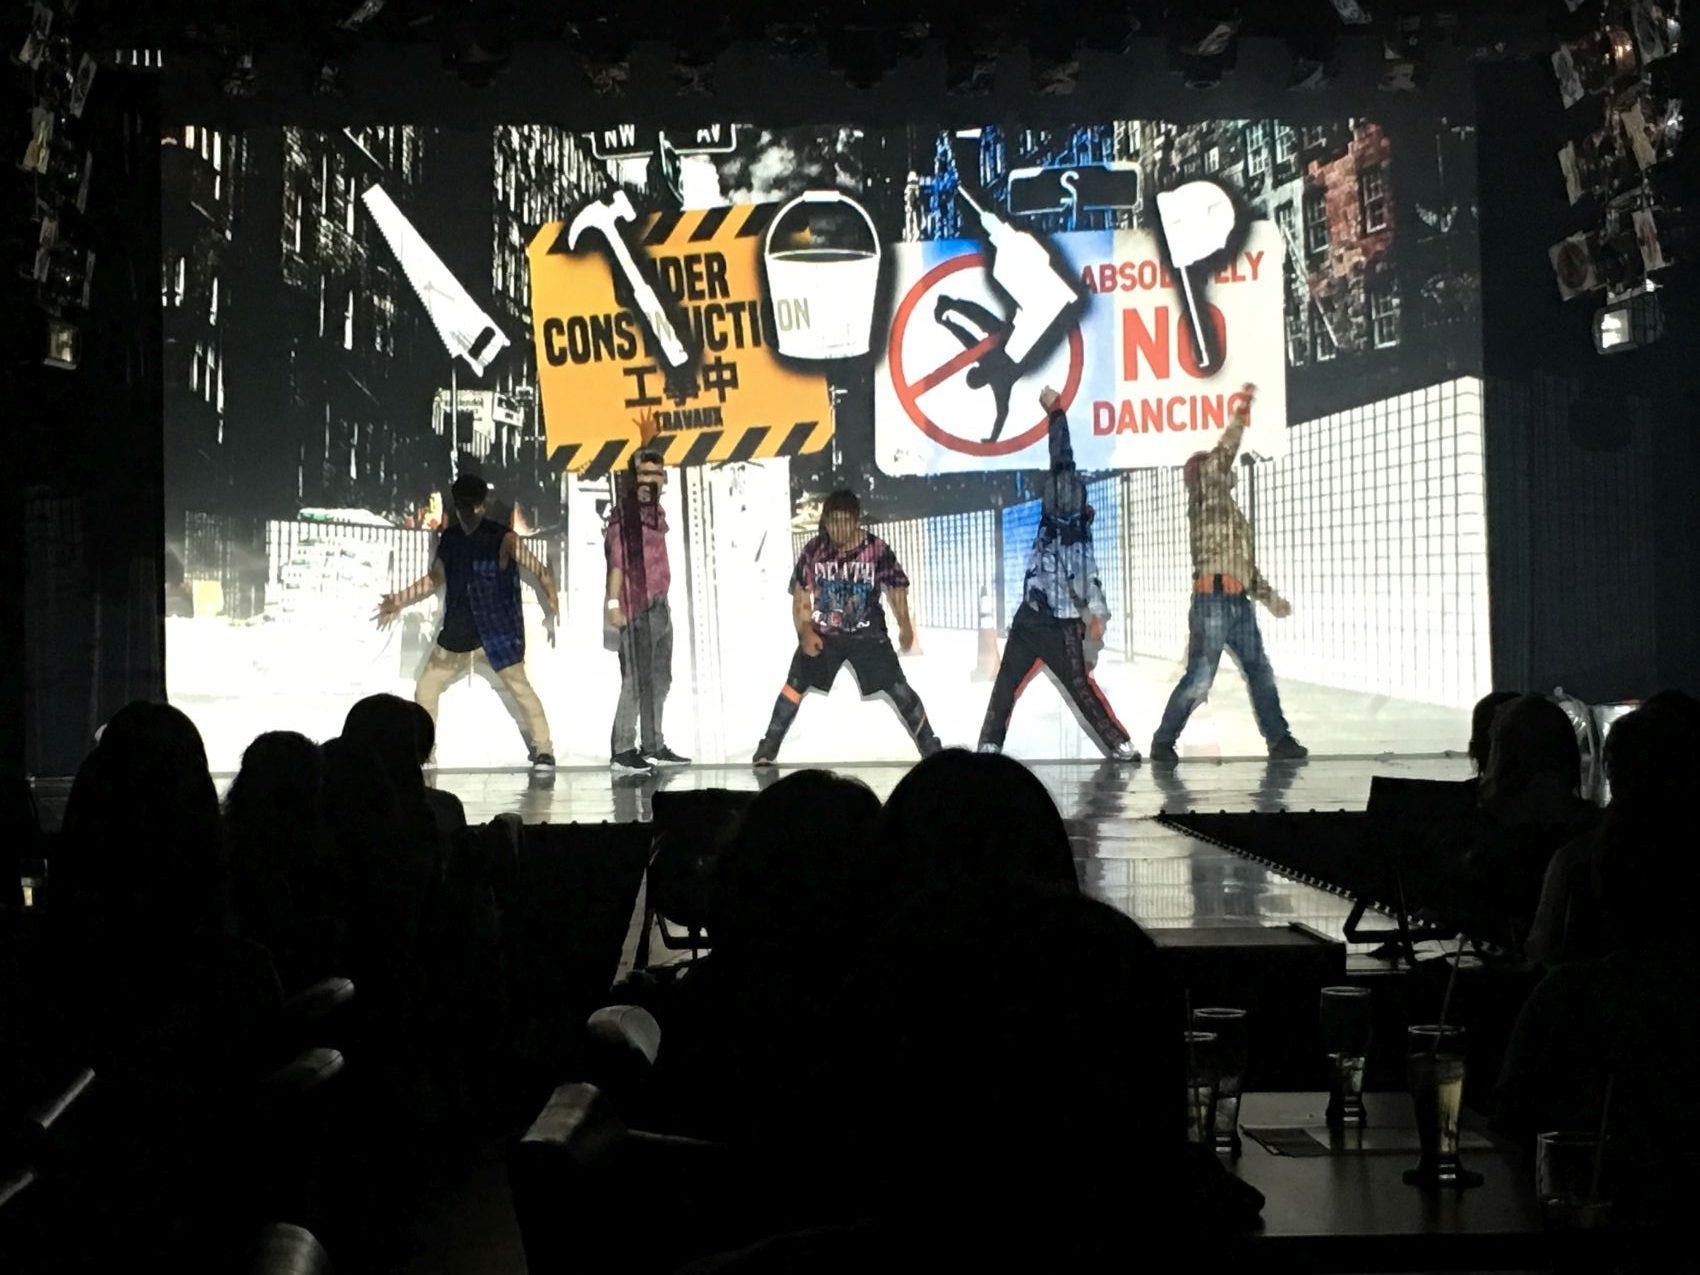 Japanese Breakdance Crew wins Edinburgh Fringe Asia Arts Award for 'Best Performance'